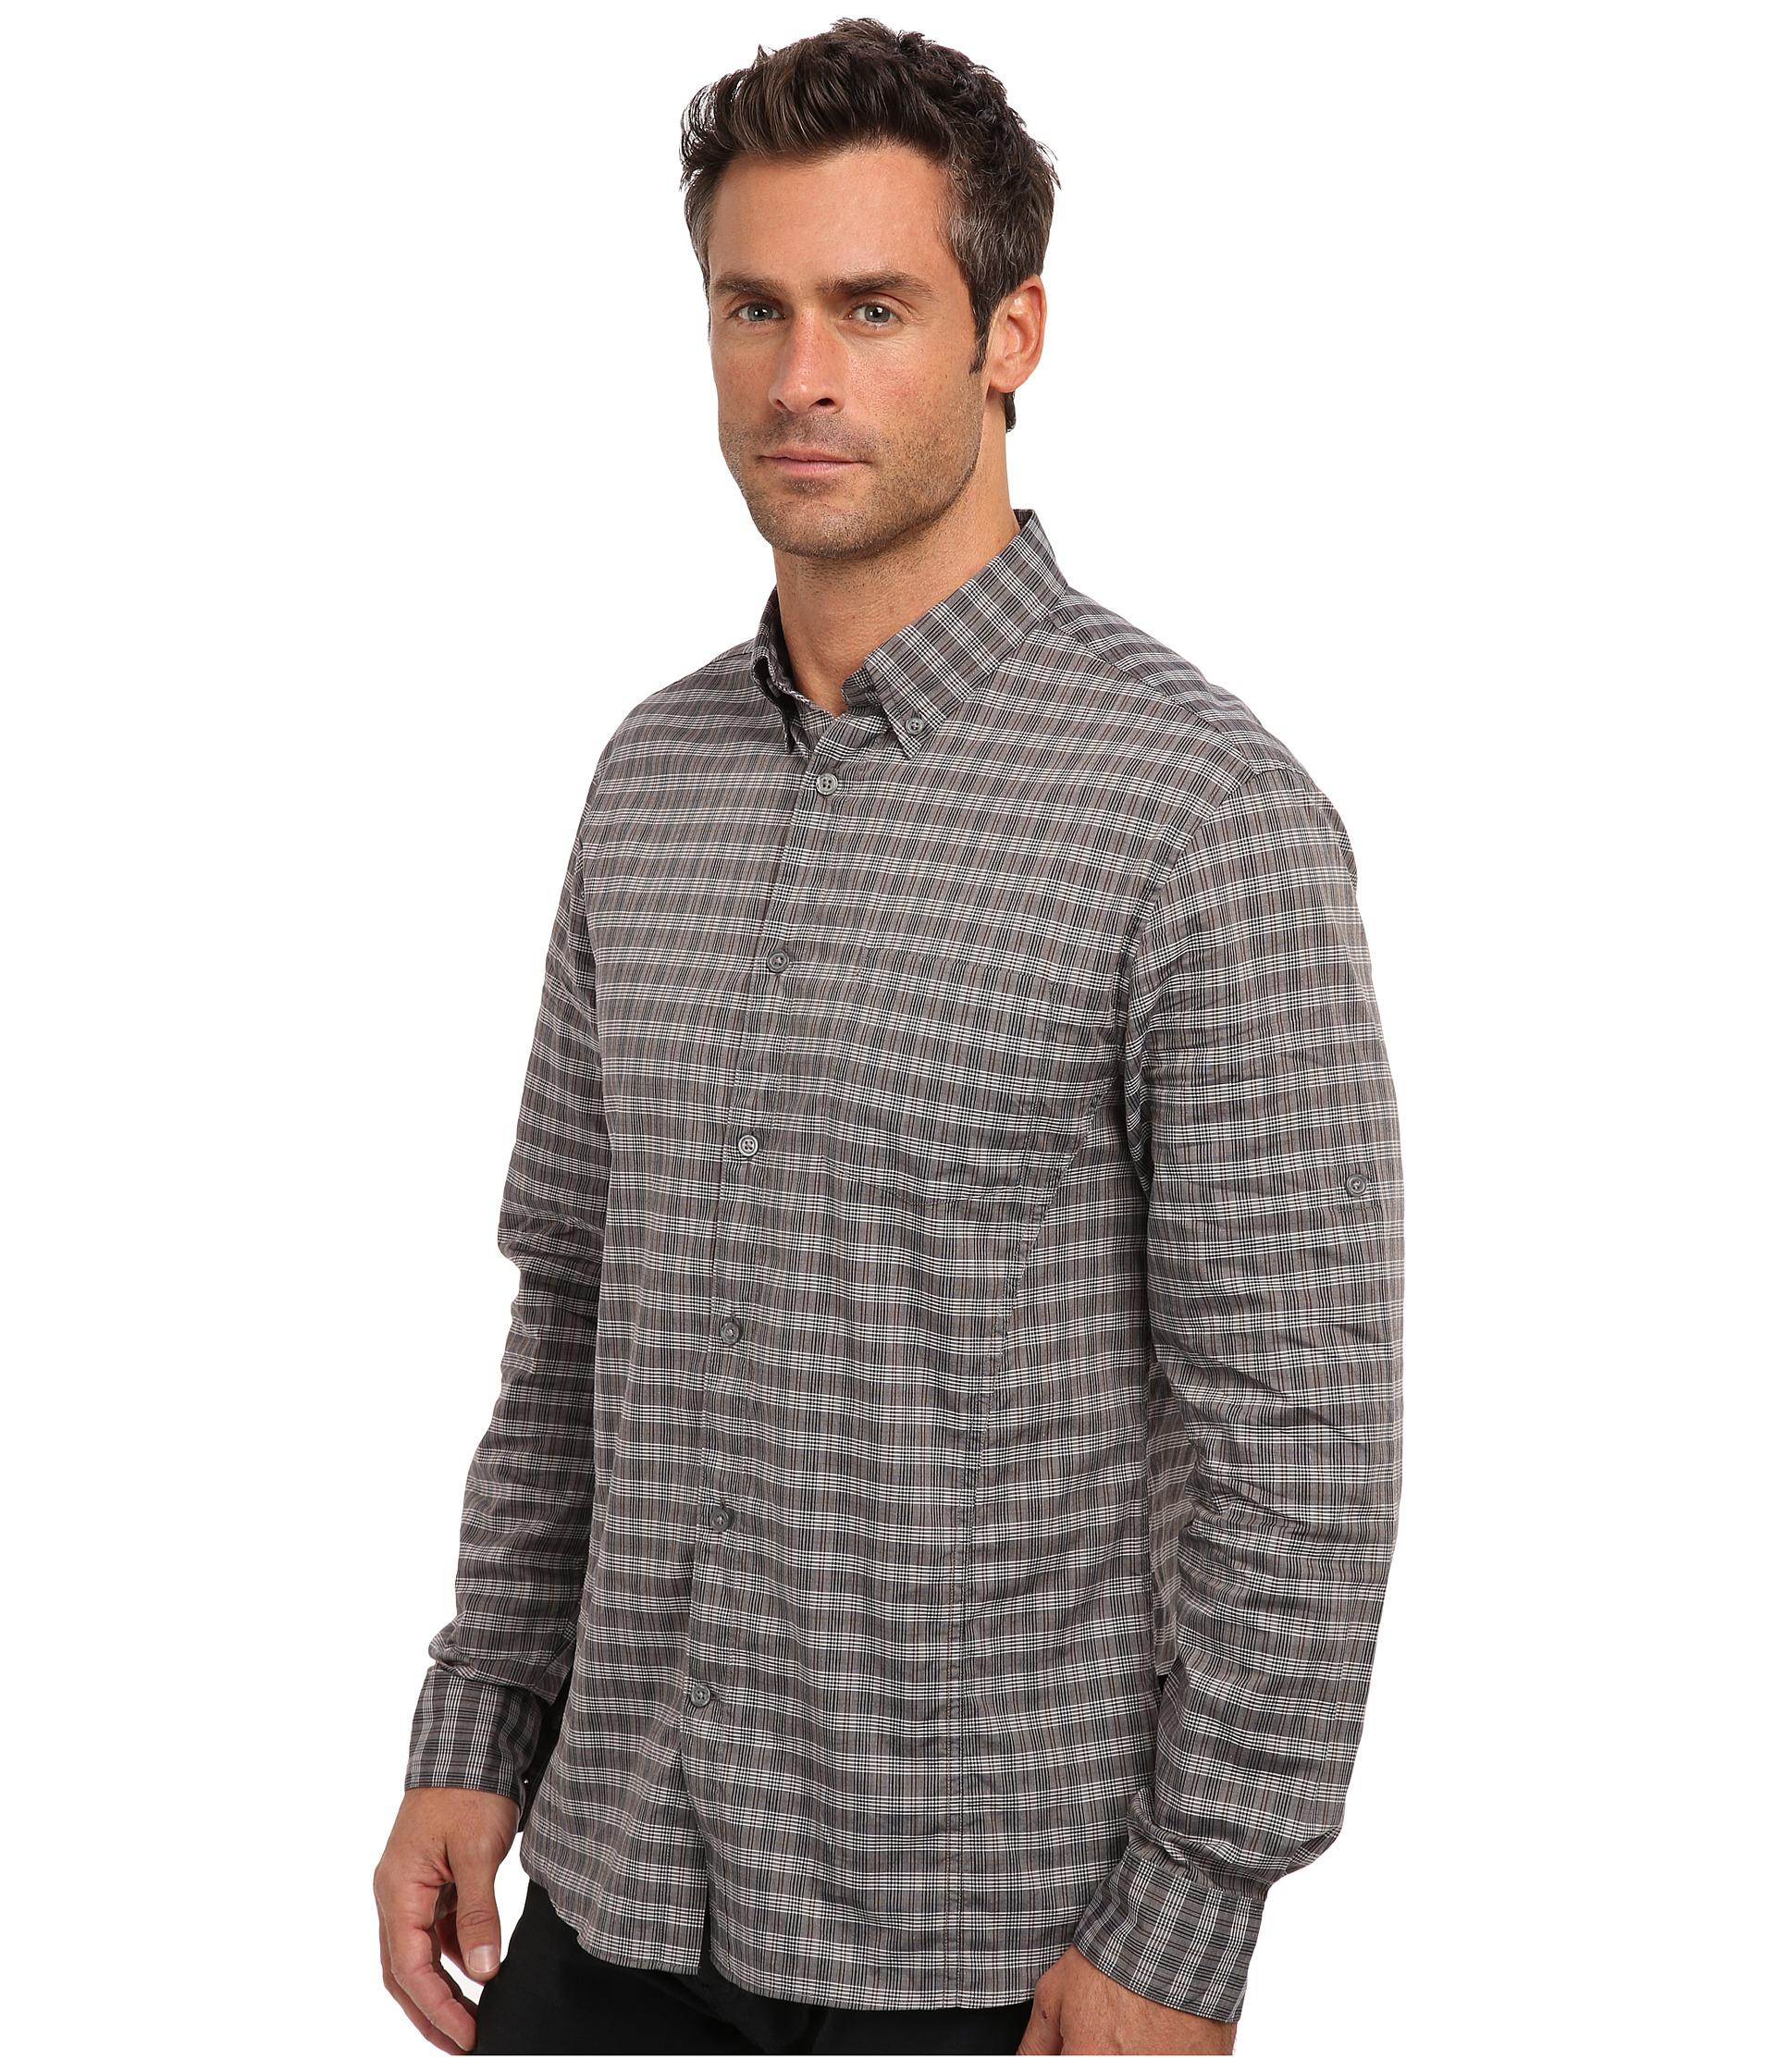 John Varvatos Plaid Roll Tab Sleeved Sportshirt In Gray